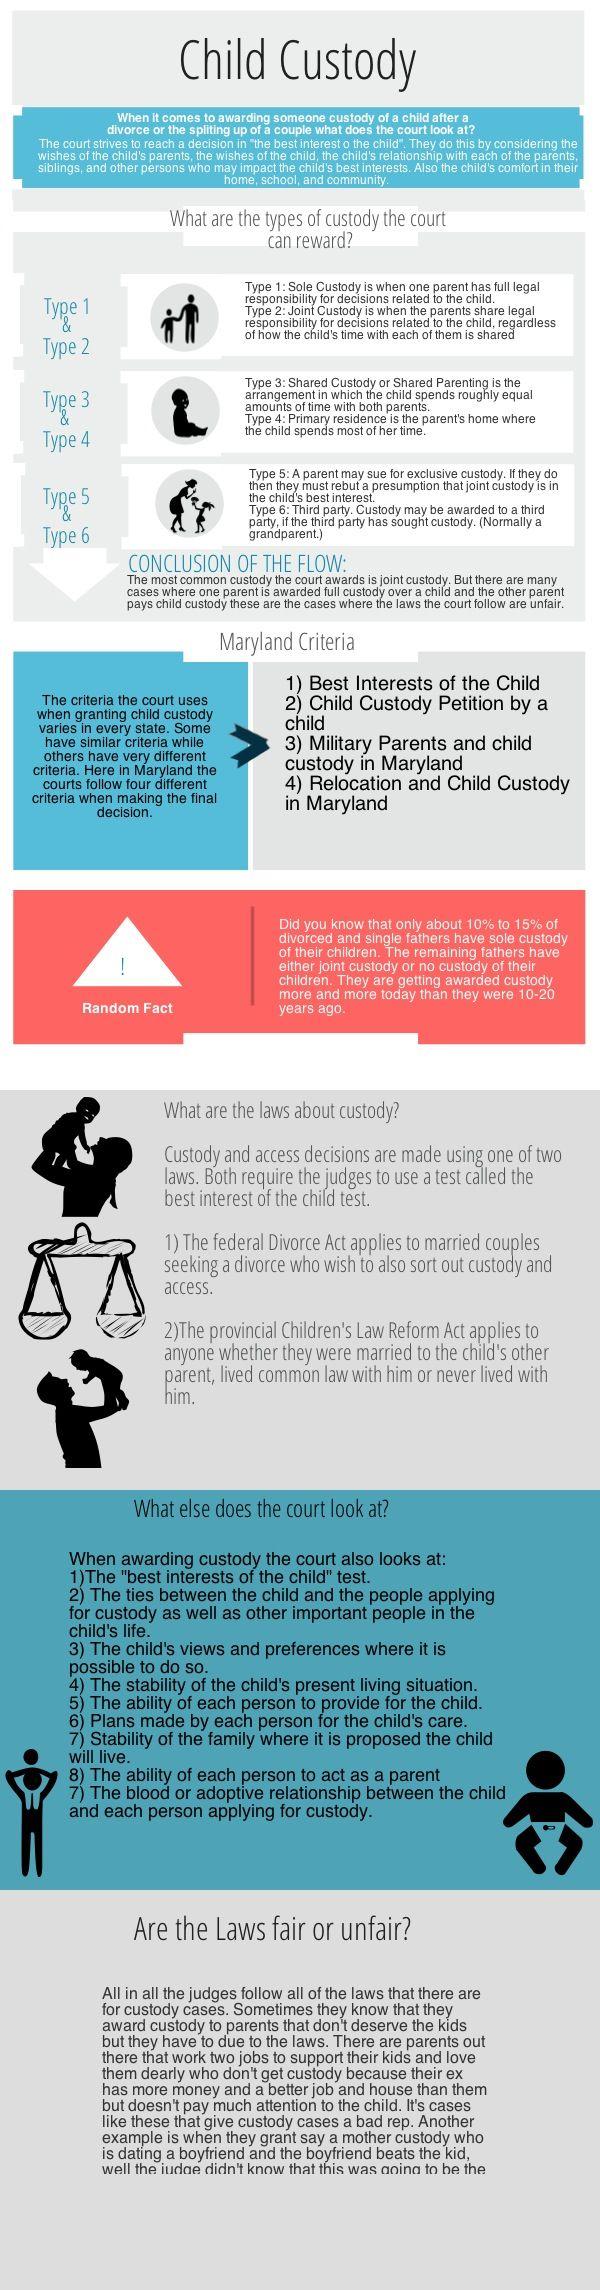 Child Custody Copy   @Piktochart Infographic